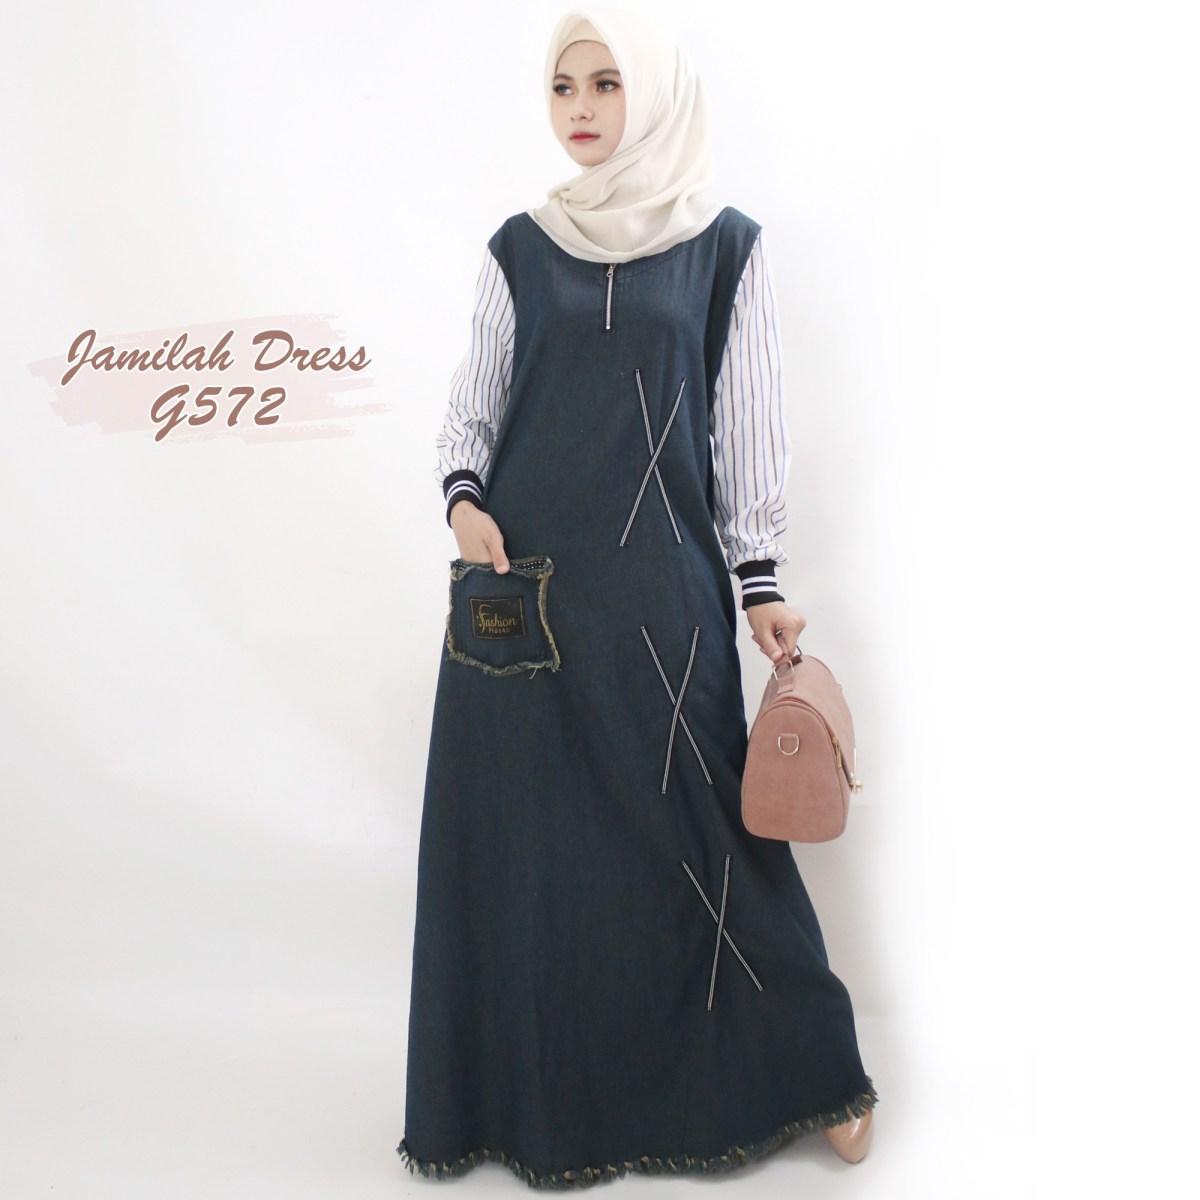 jamilah dress g572 baju hijab style ootd